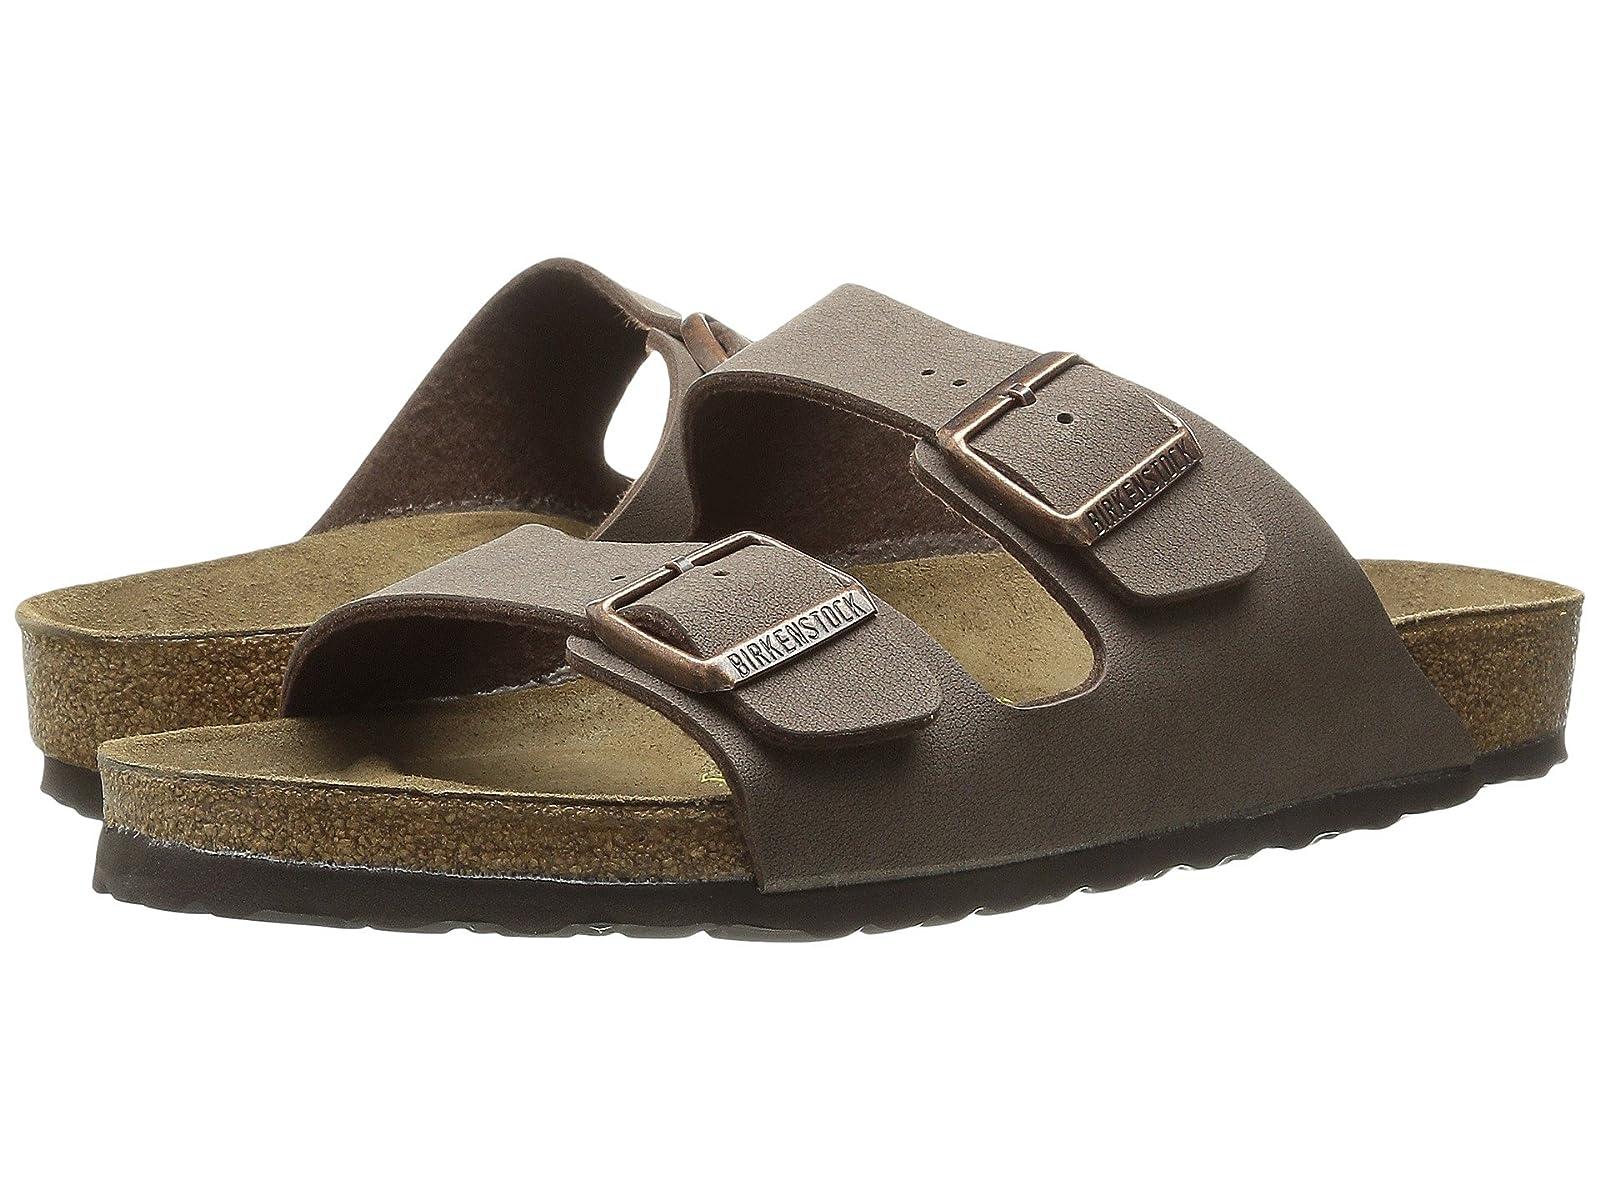 Birkenstock Arizona - Birkibuc™ (Unisex)Comfortable and distinctive shoes